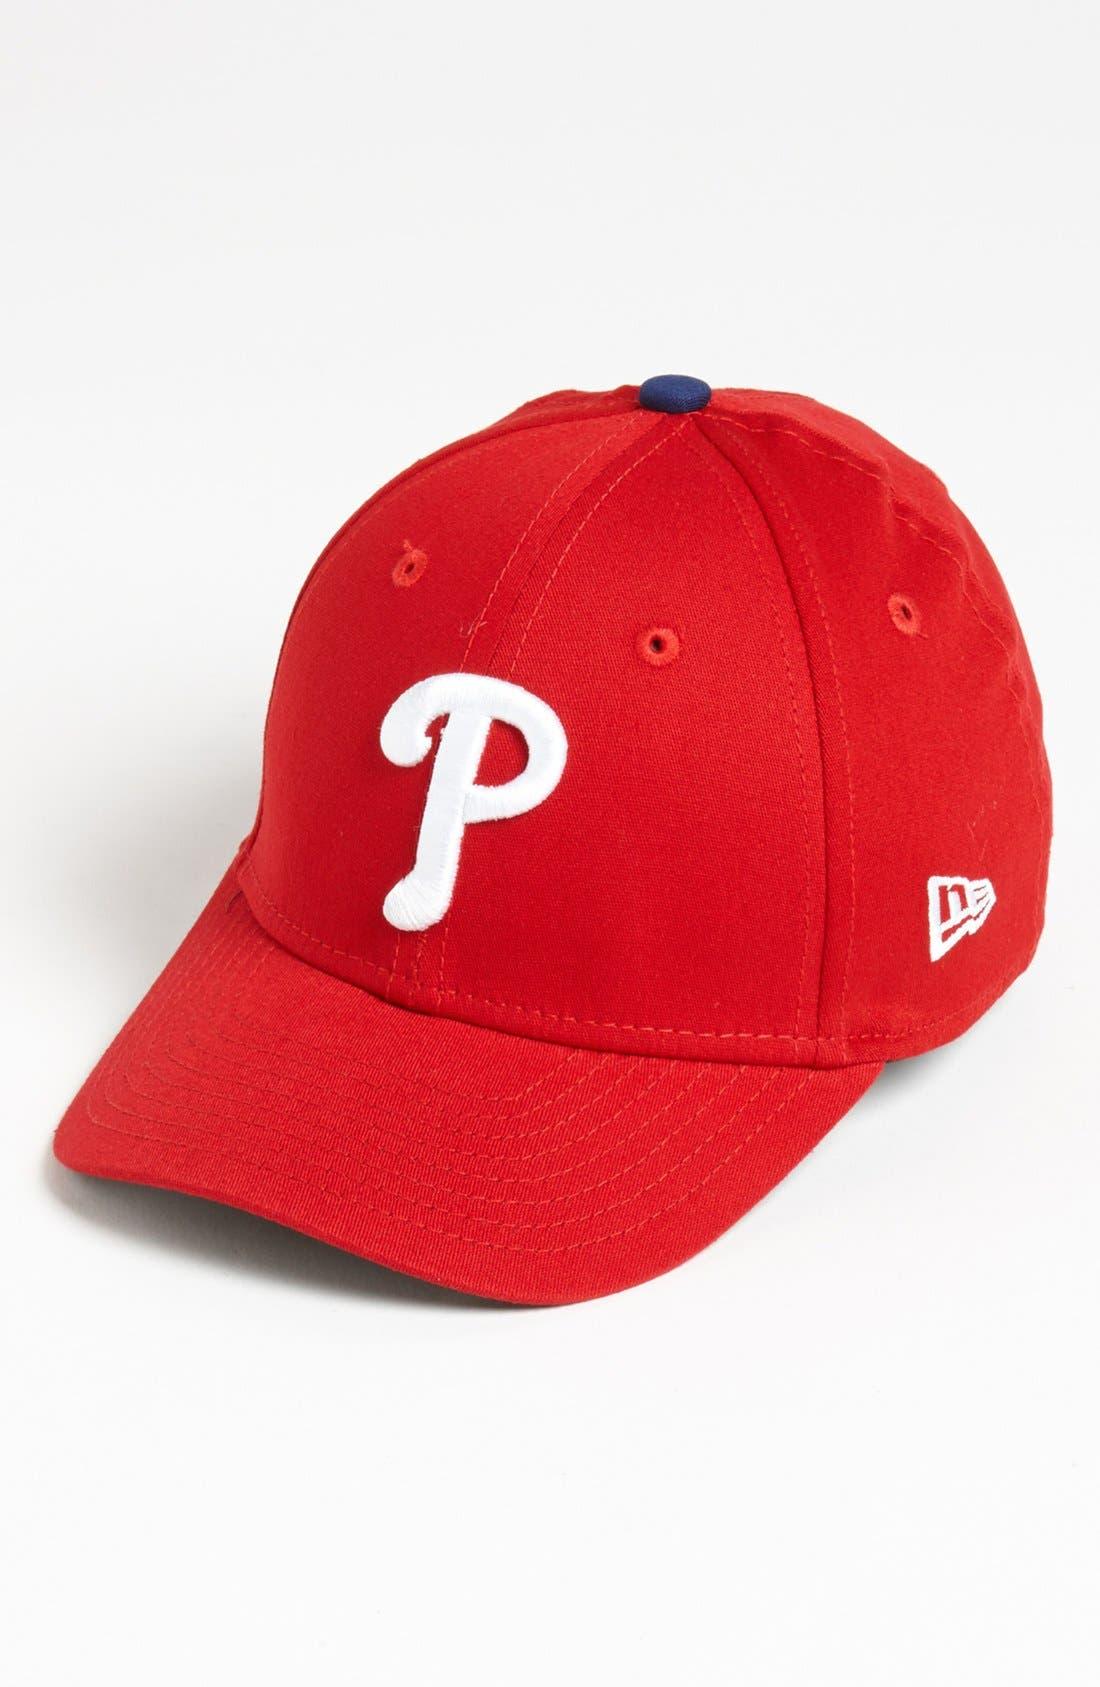 Main Image - New Era Cap 'Philadelphia Phillies - Tie Breaker' Baseball Cap (Big Boys)